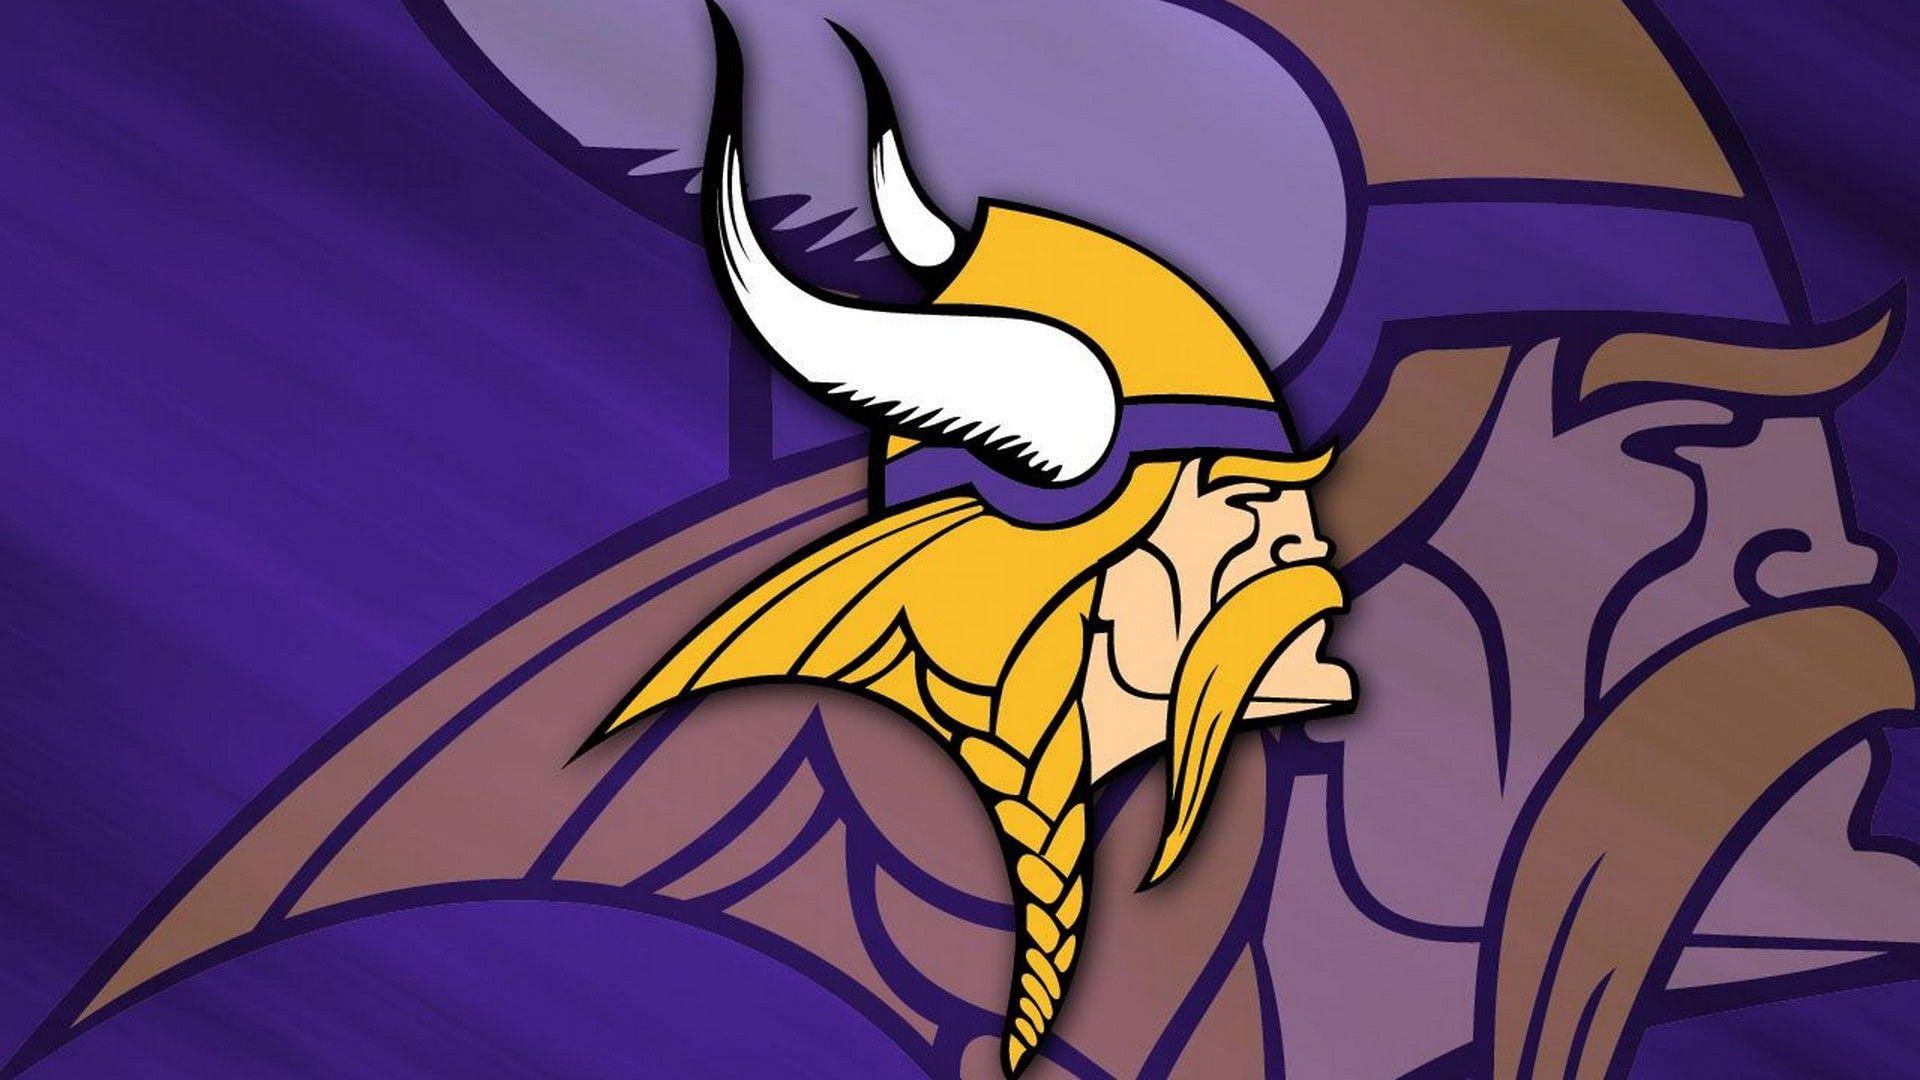 Minnesota Vikings wallpaper background